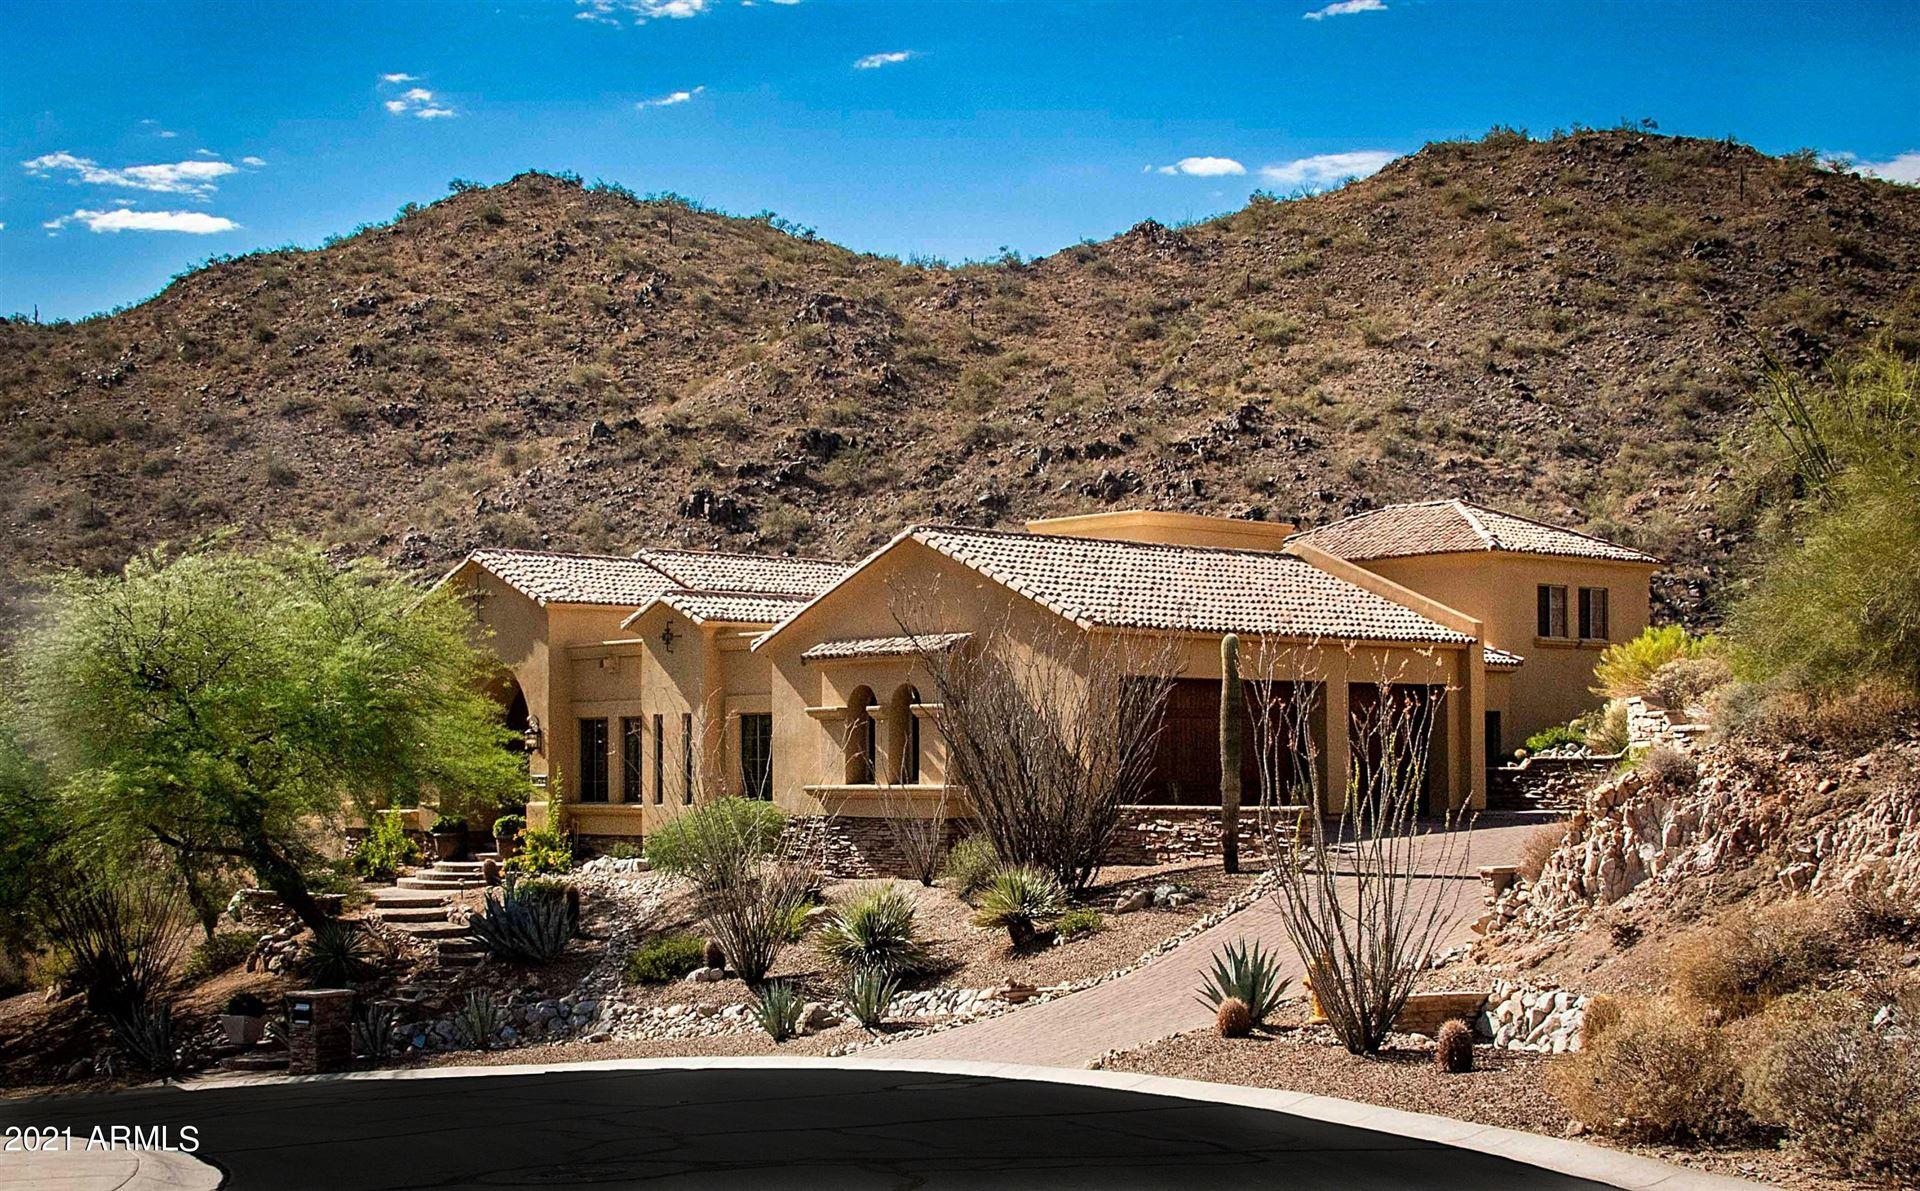 Photo of 14536 E GECKO Court, Fountain Hills, AZ 85268 (MLS # 6307622)